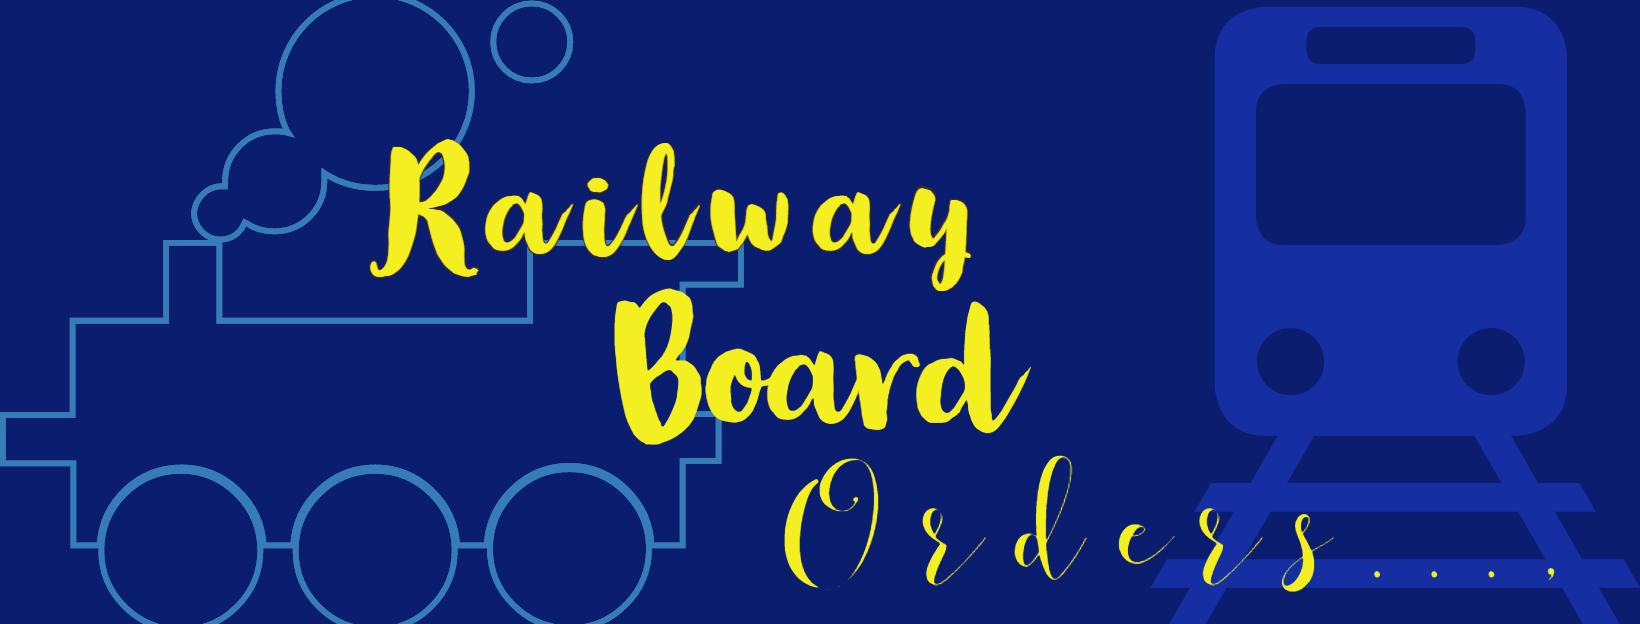 Latest Railway Board Orders